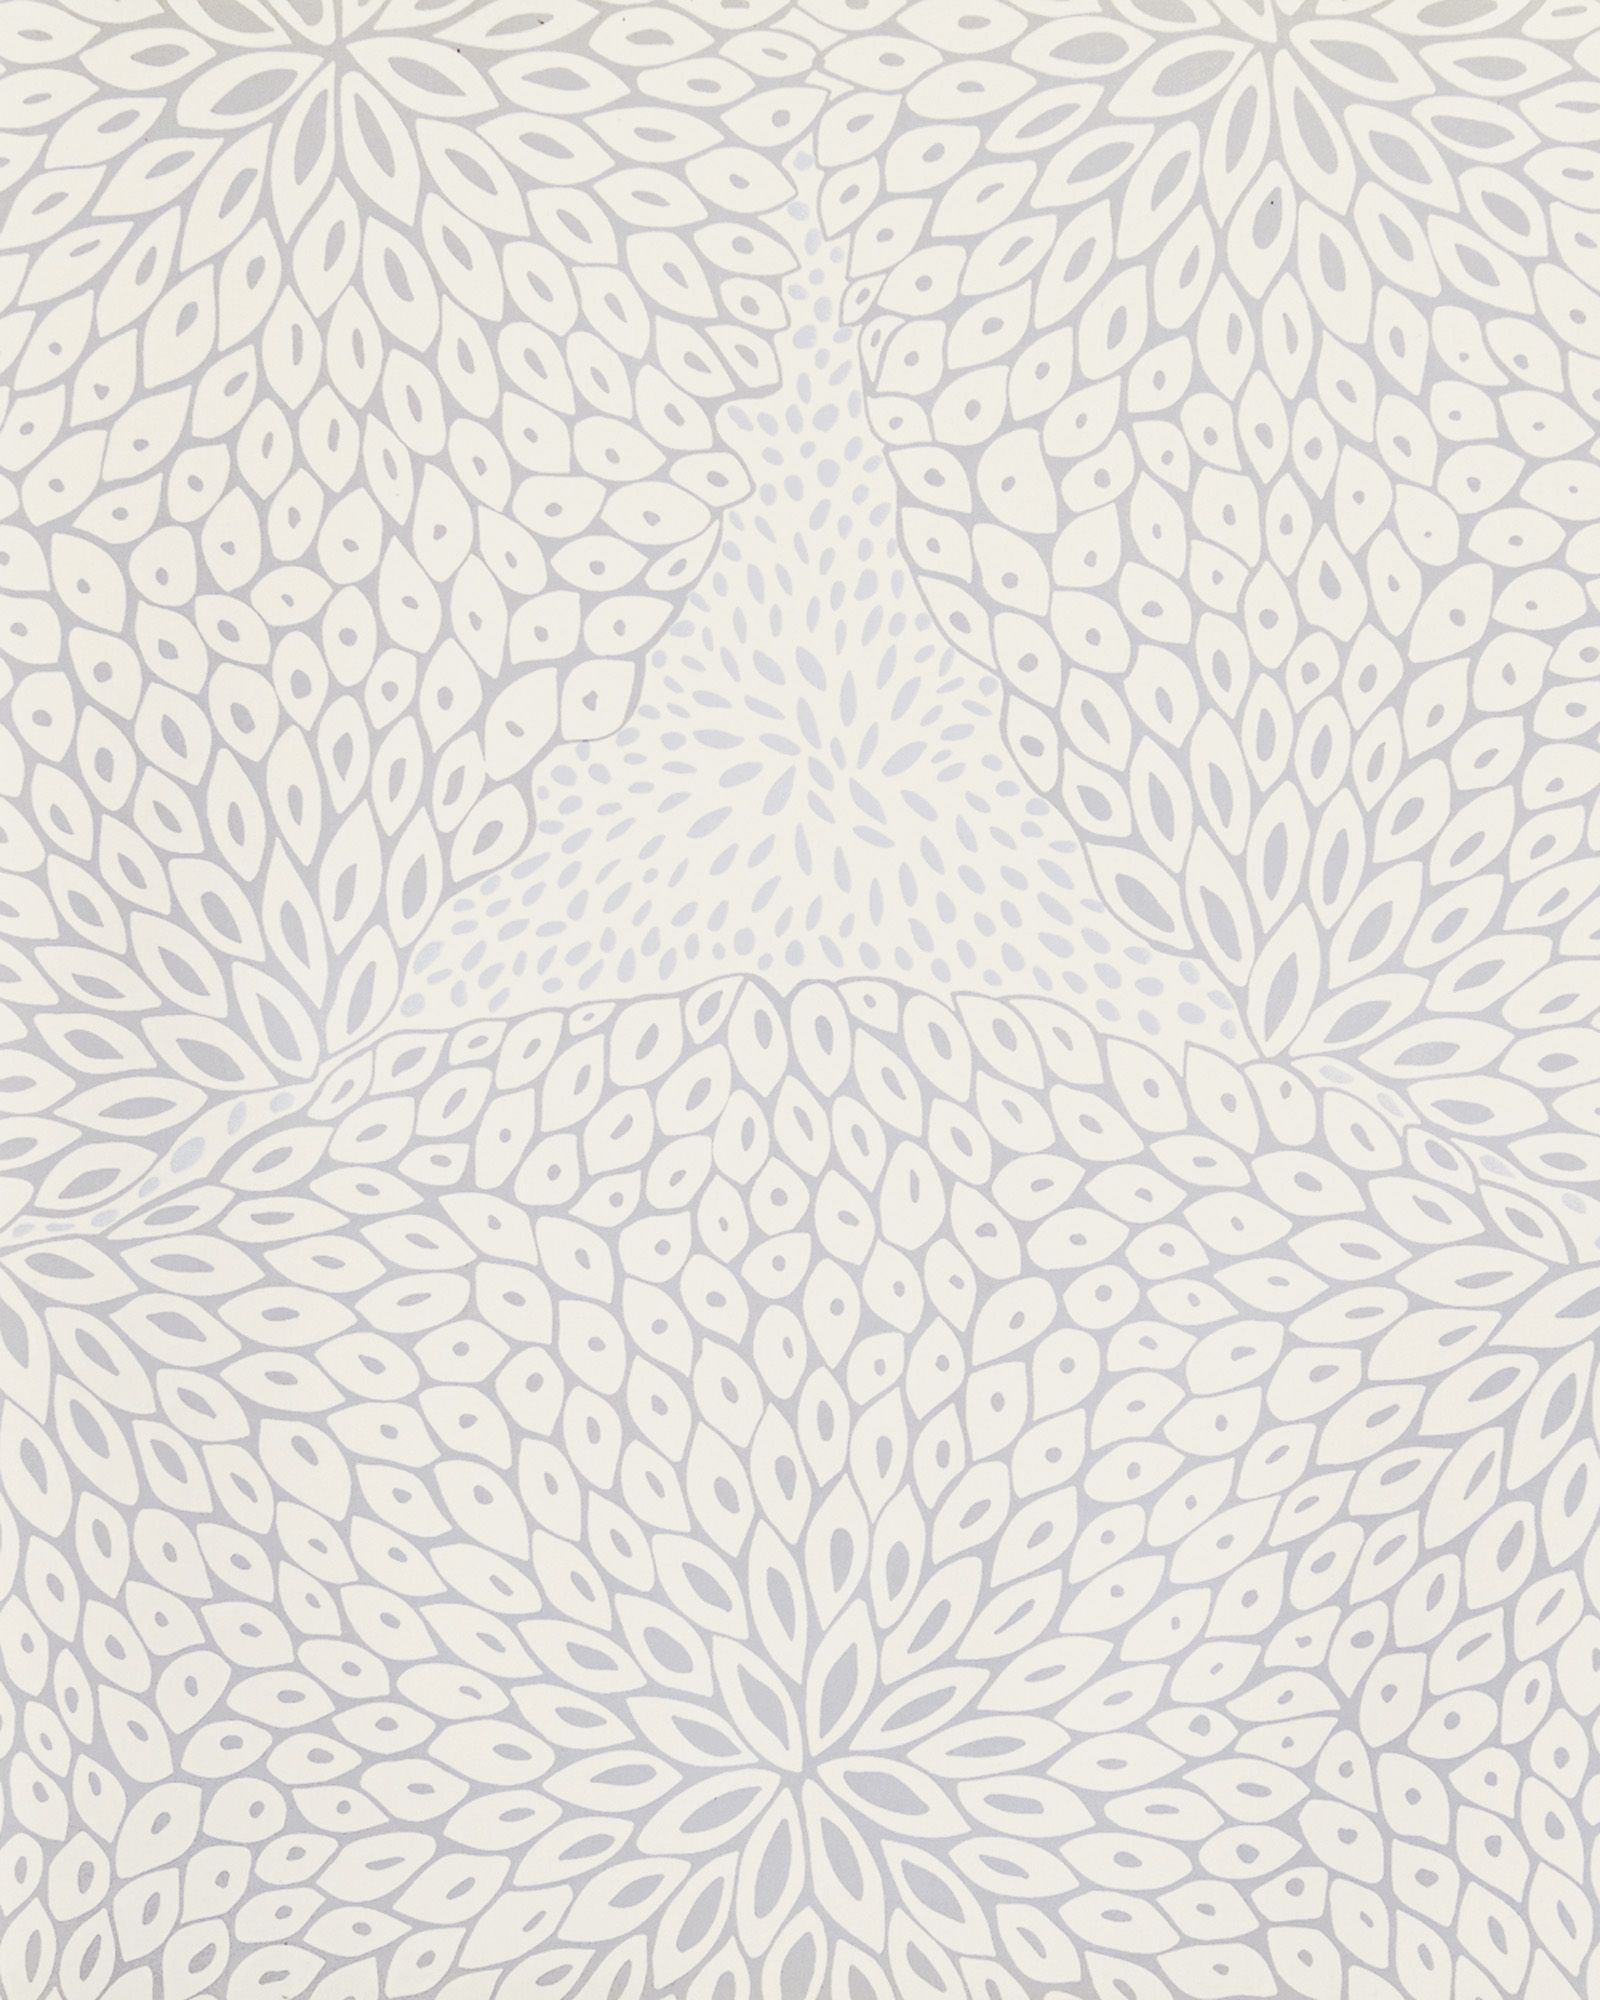 Dahlia WallpaperDahlia Wallpaper Lily wallpaper, Serena